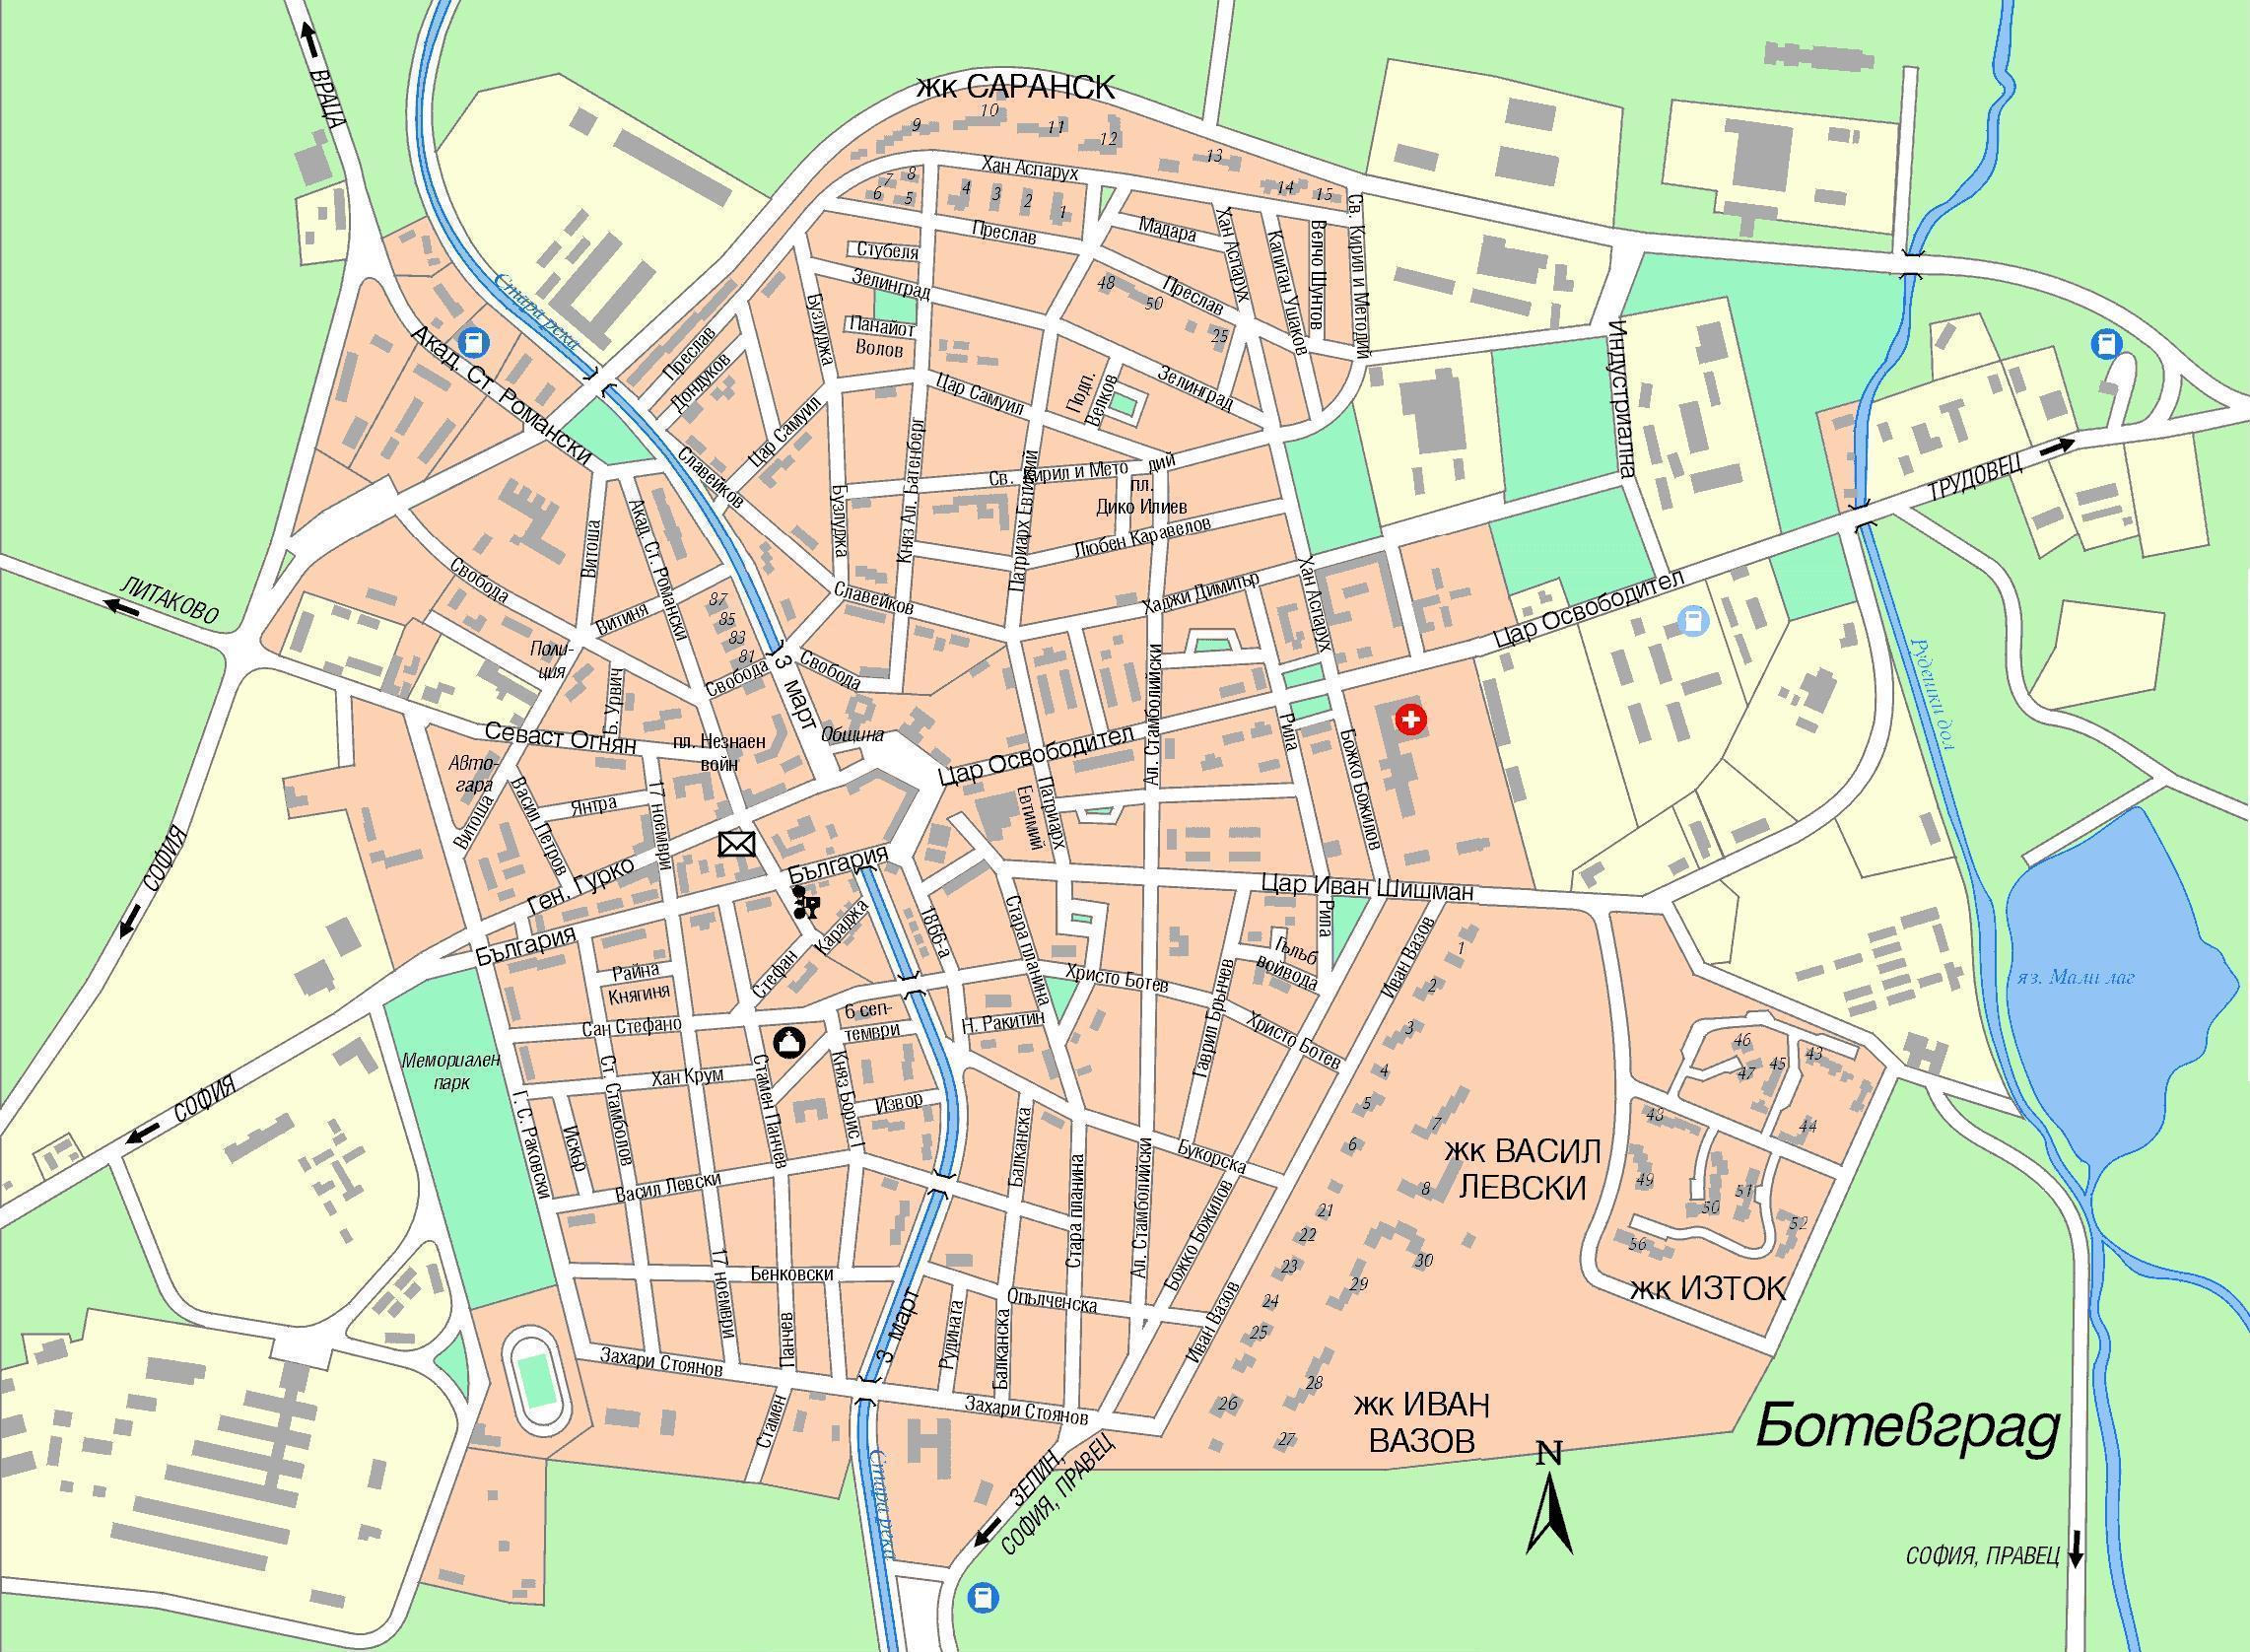 Karta Goroda Botevgrad 66 Sofijskaya Oblast Besplatno